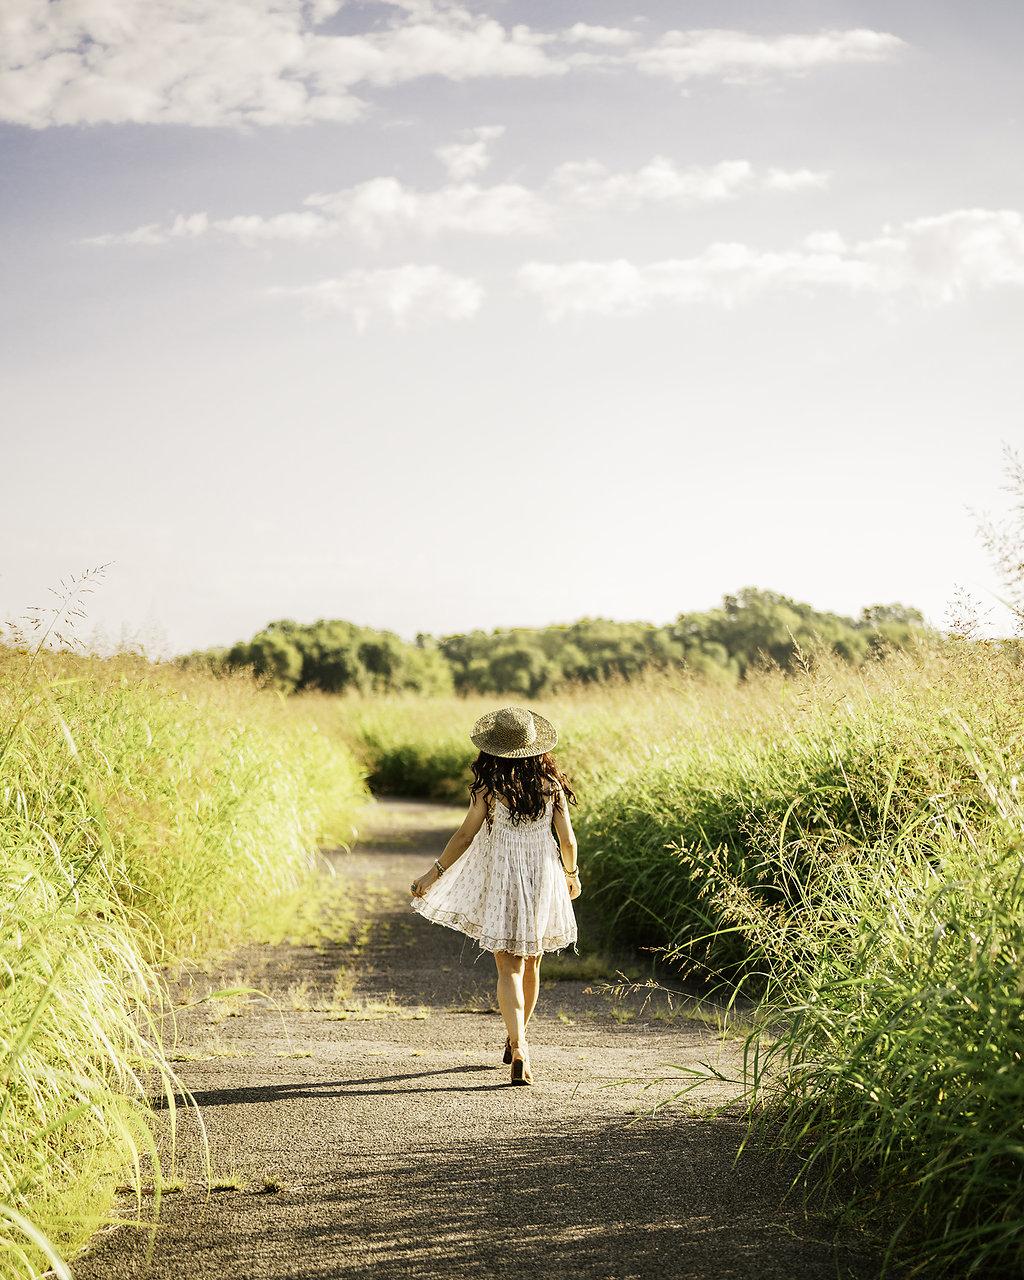 summer's swan song